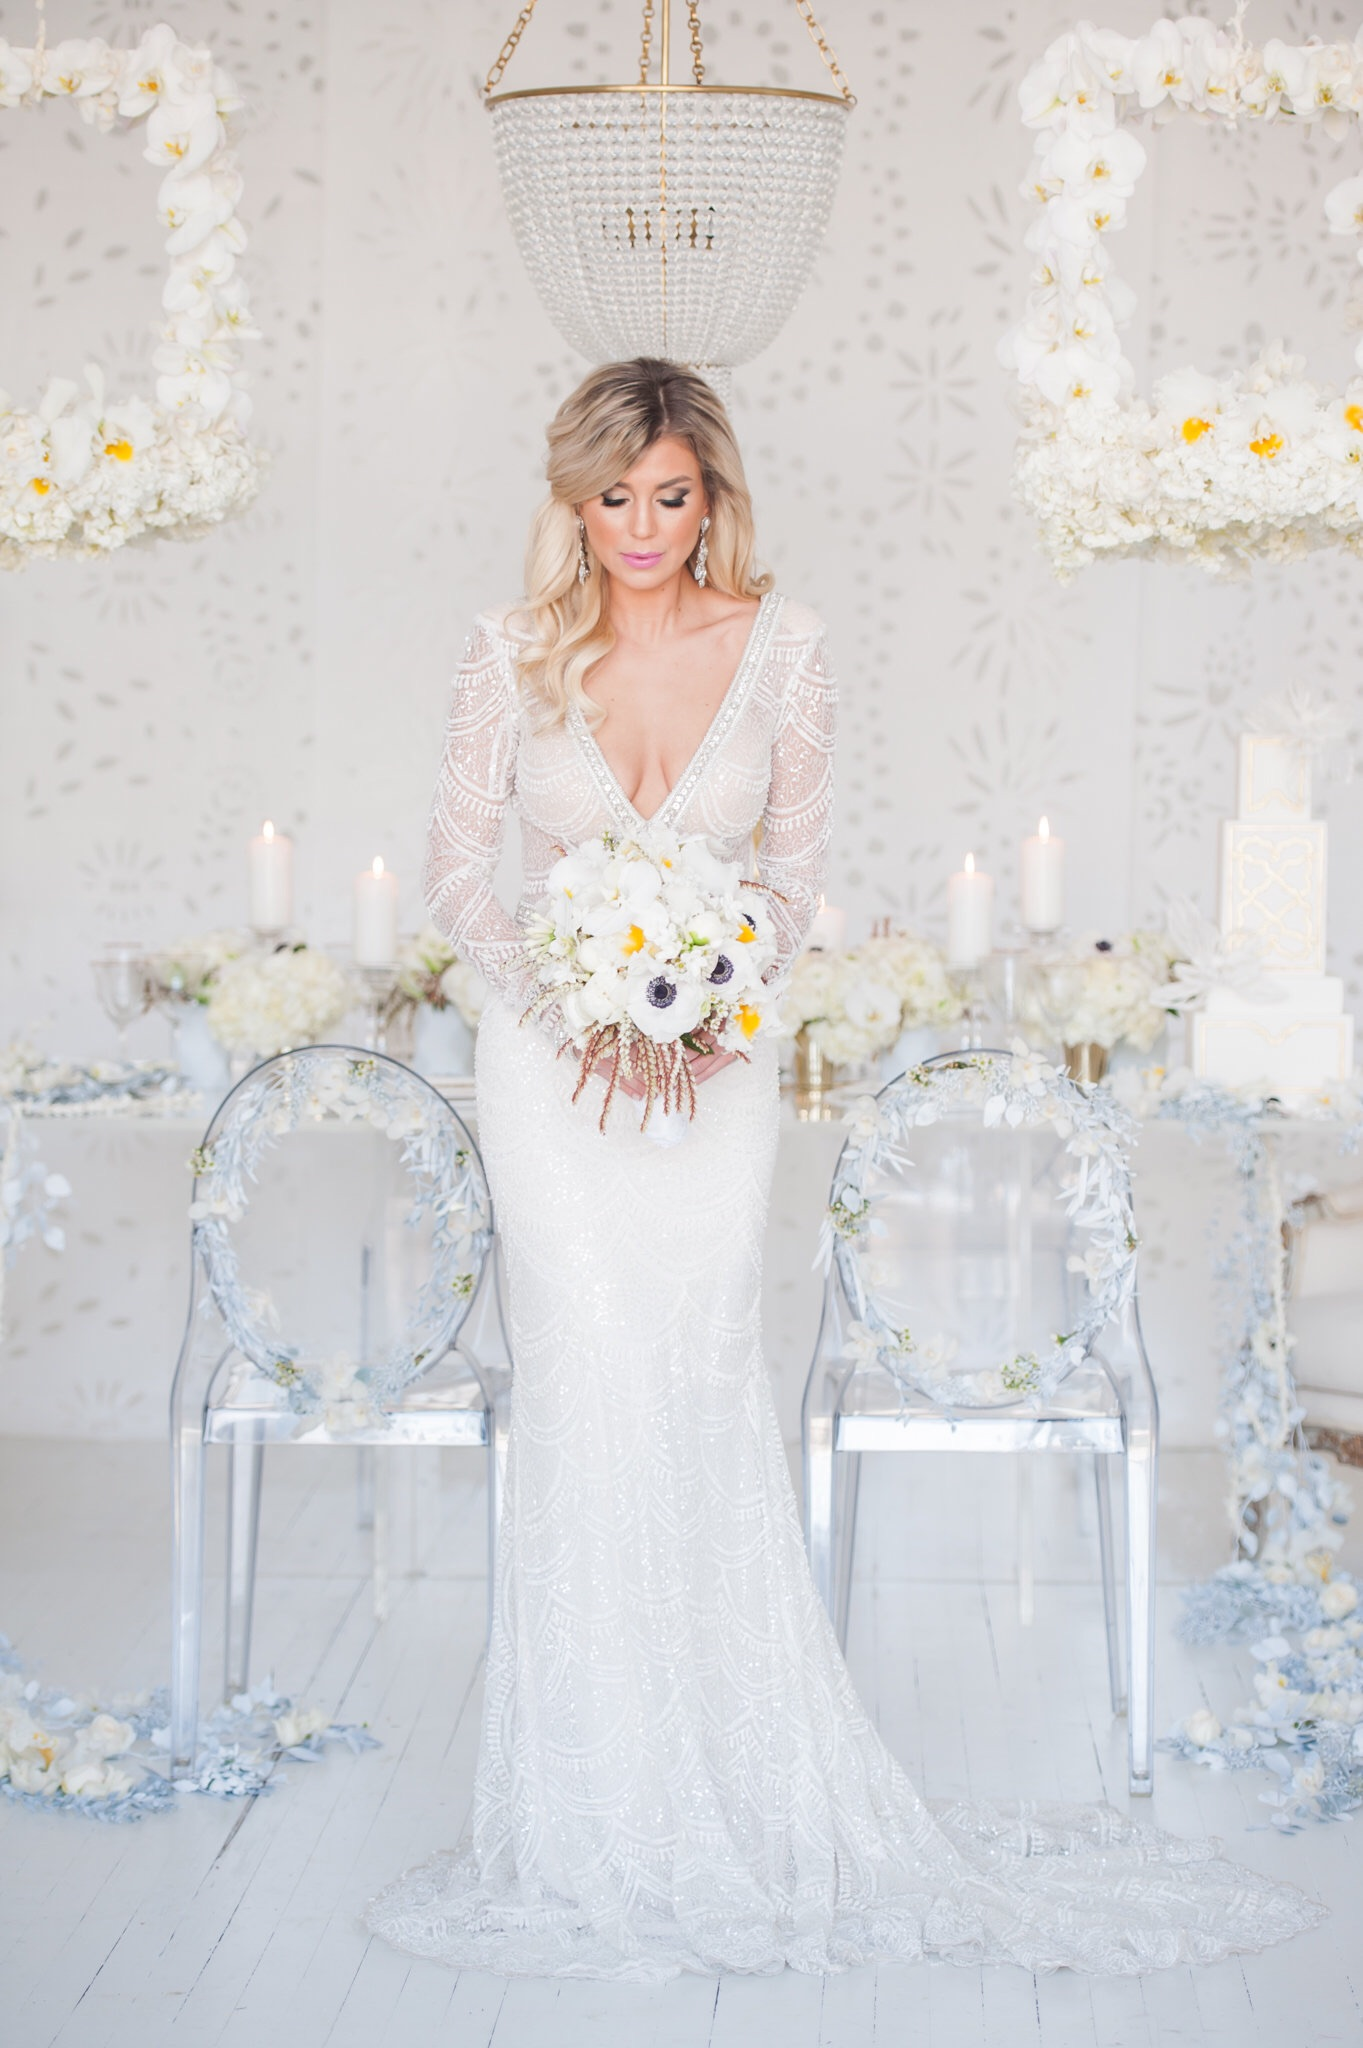 GOWN •  Berta Bridal    from   Blush Bridal